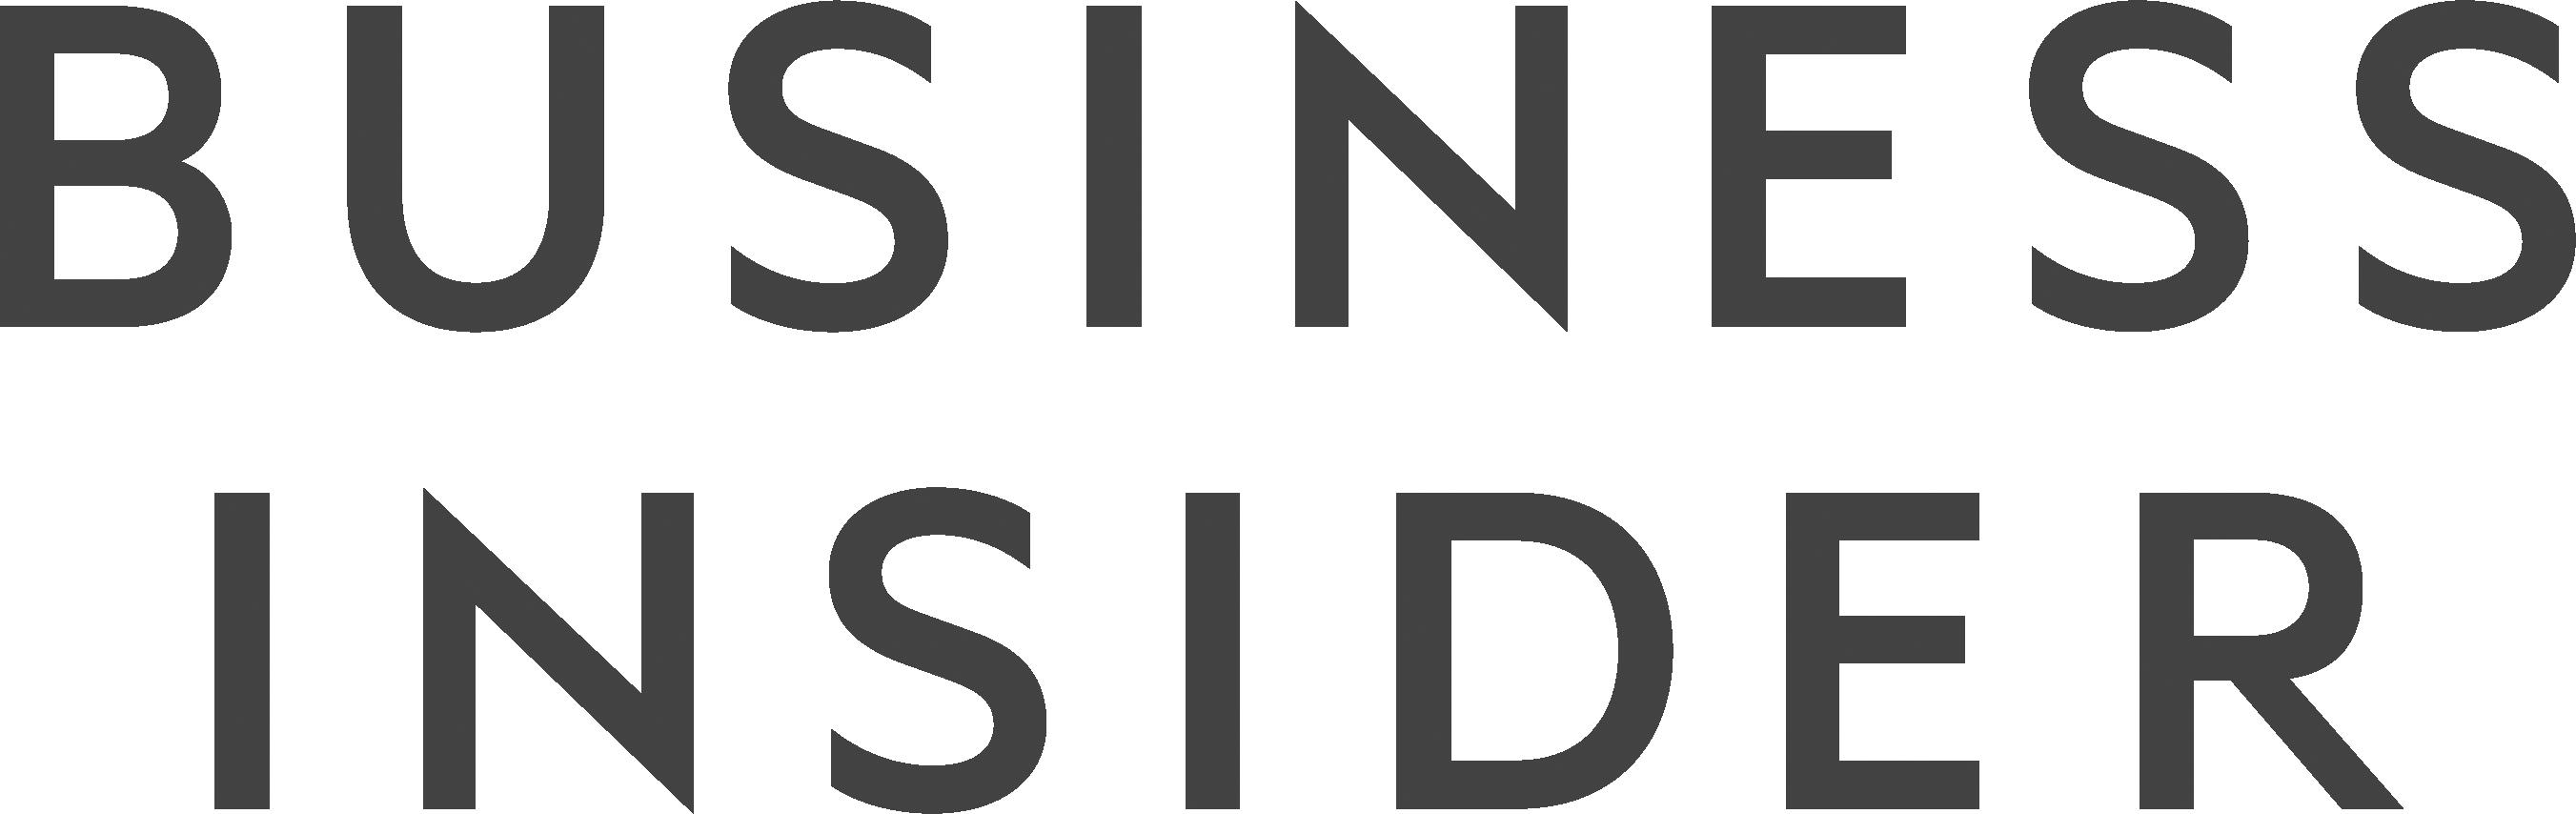 business-insider-logos-copy